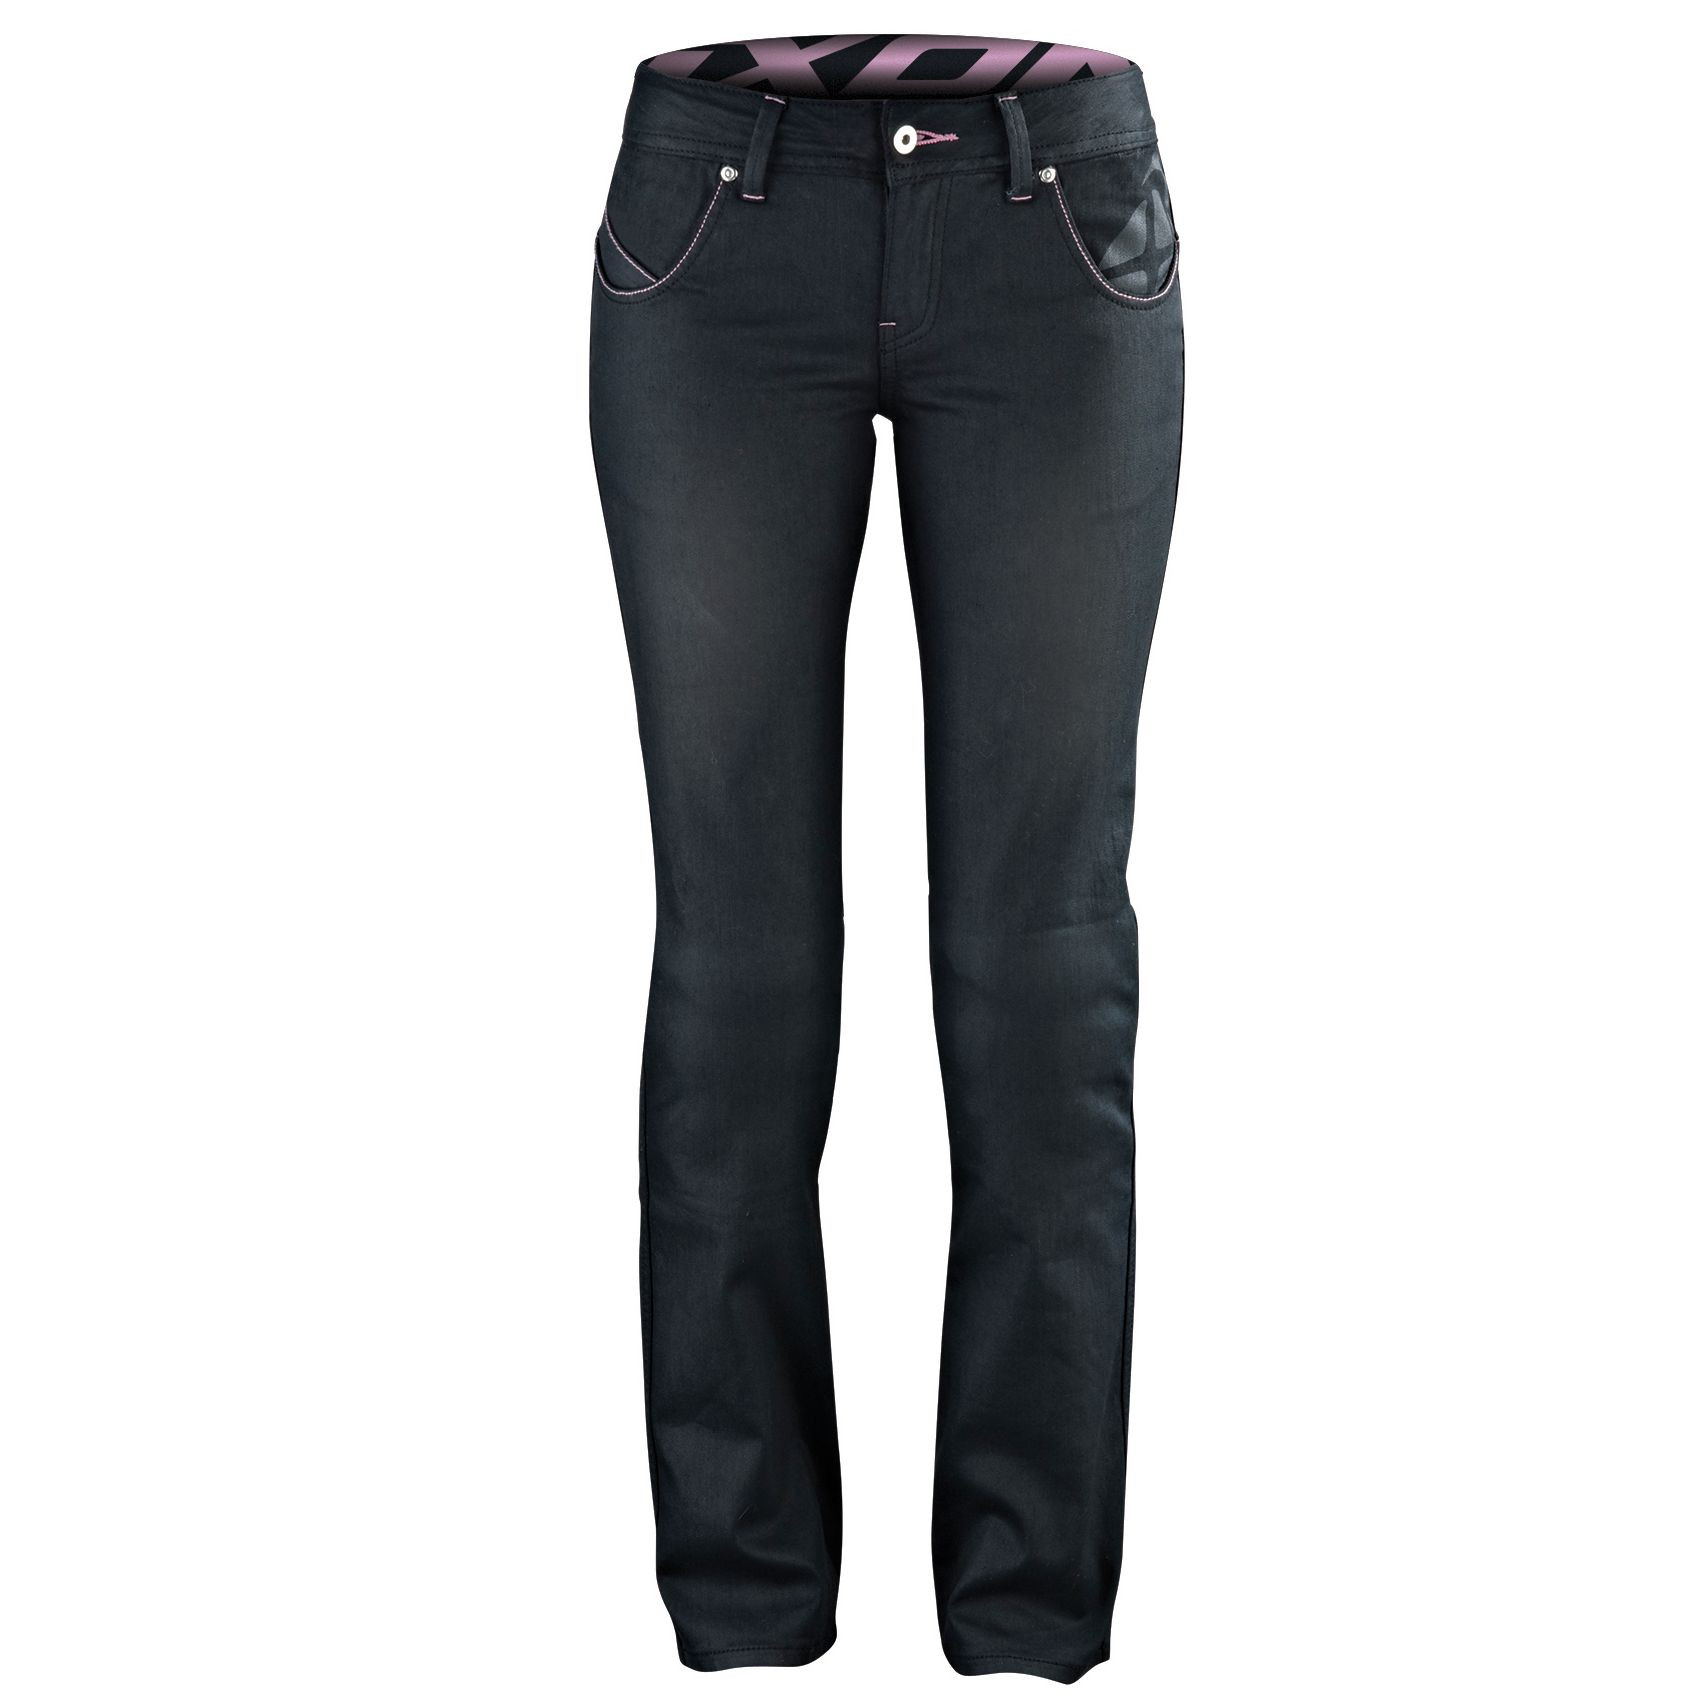 Ixon woman jeans Britney with Kevlar reinforcements black